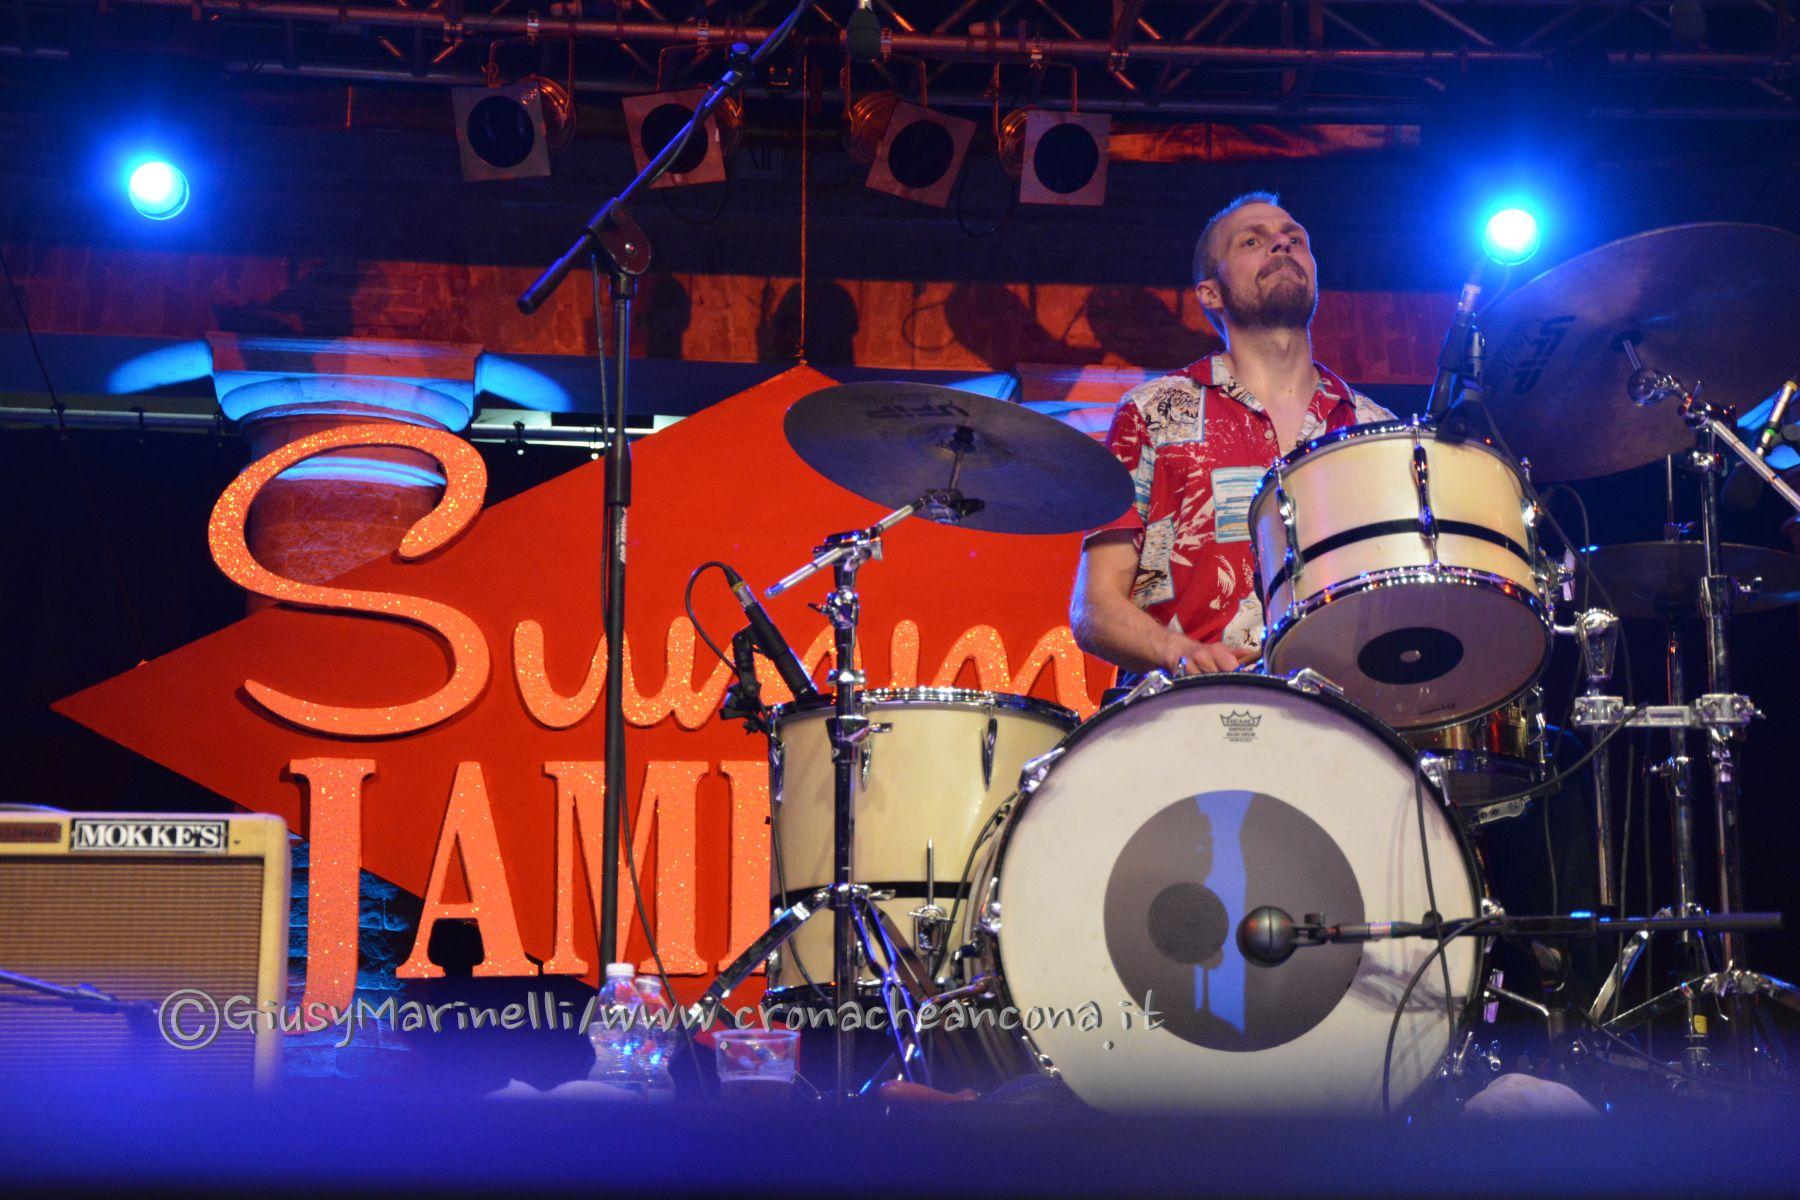 Summer_Jamboree-1-DSC_0150